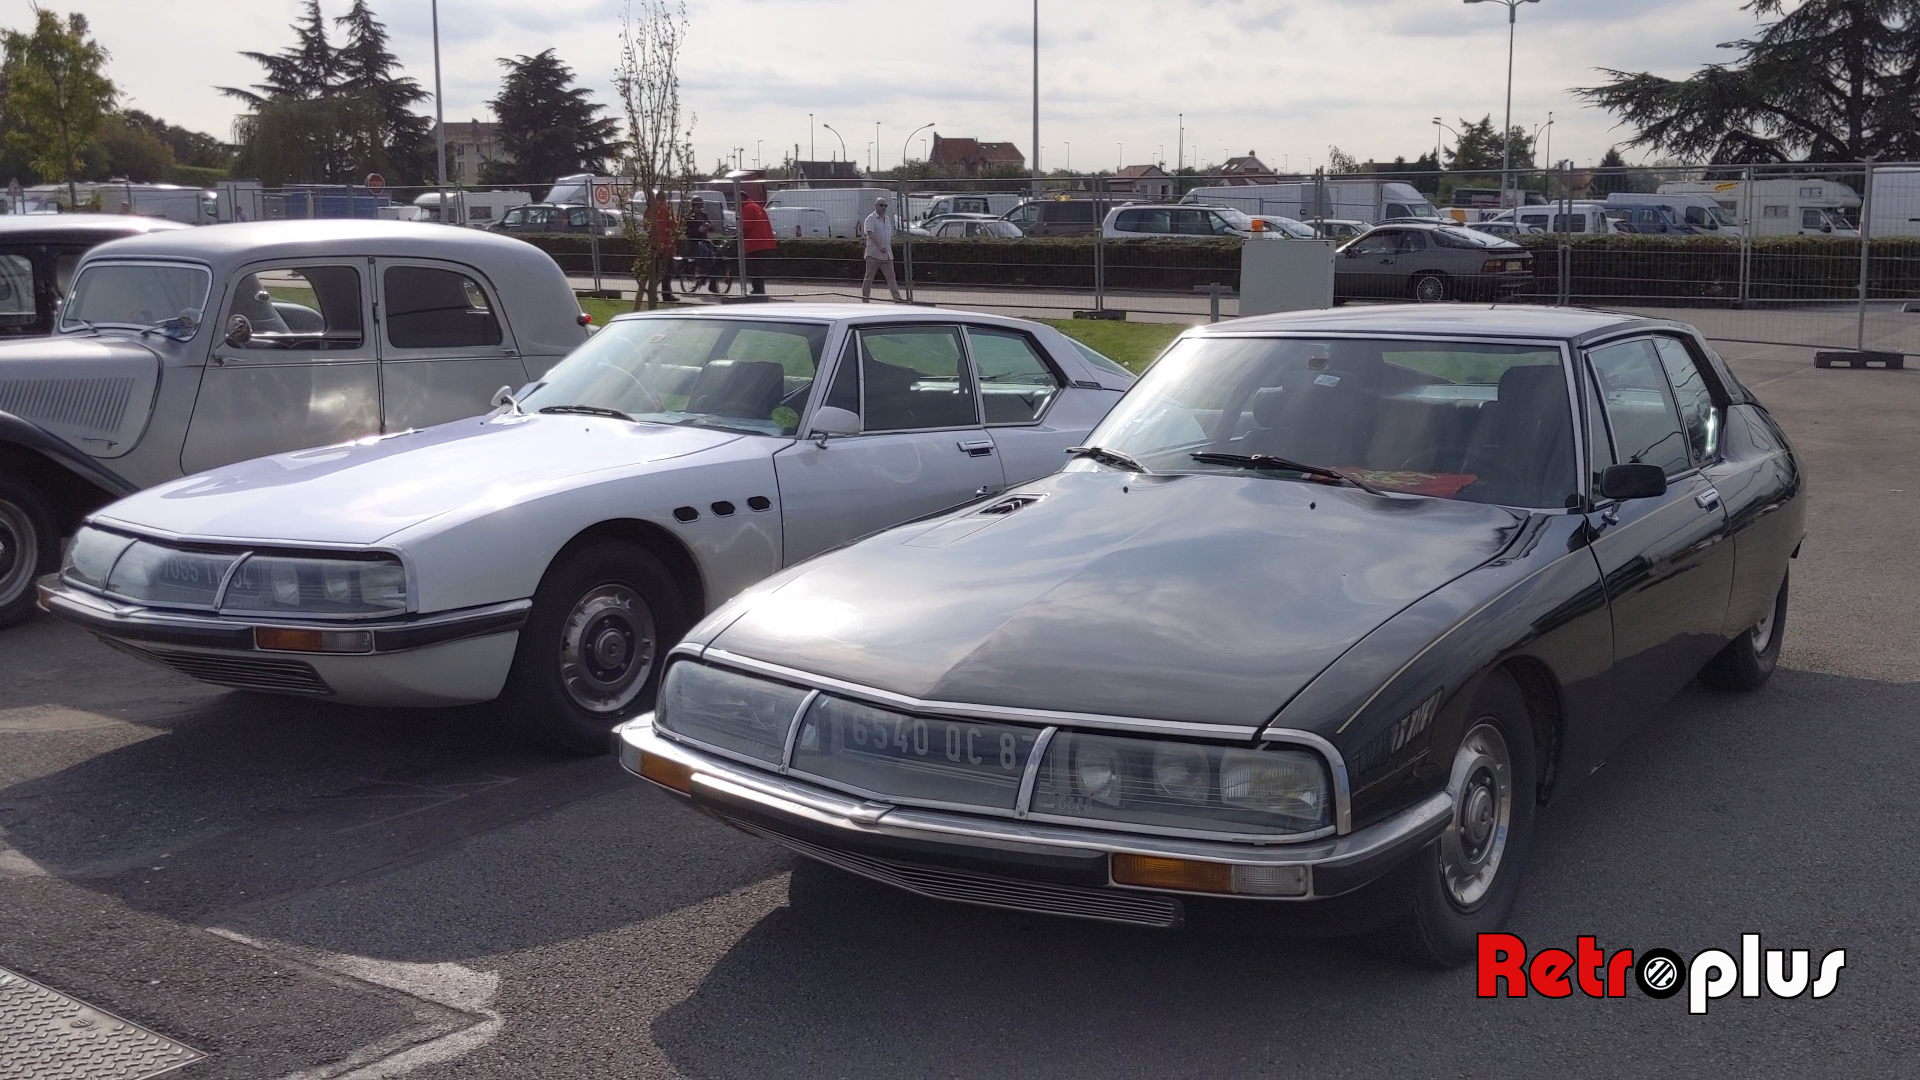 Automedon2019-parkingCitroen18